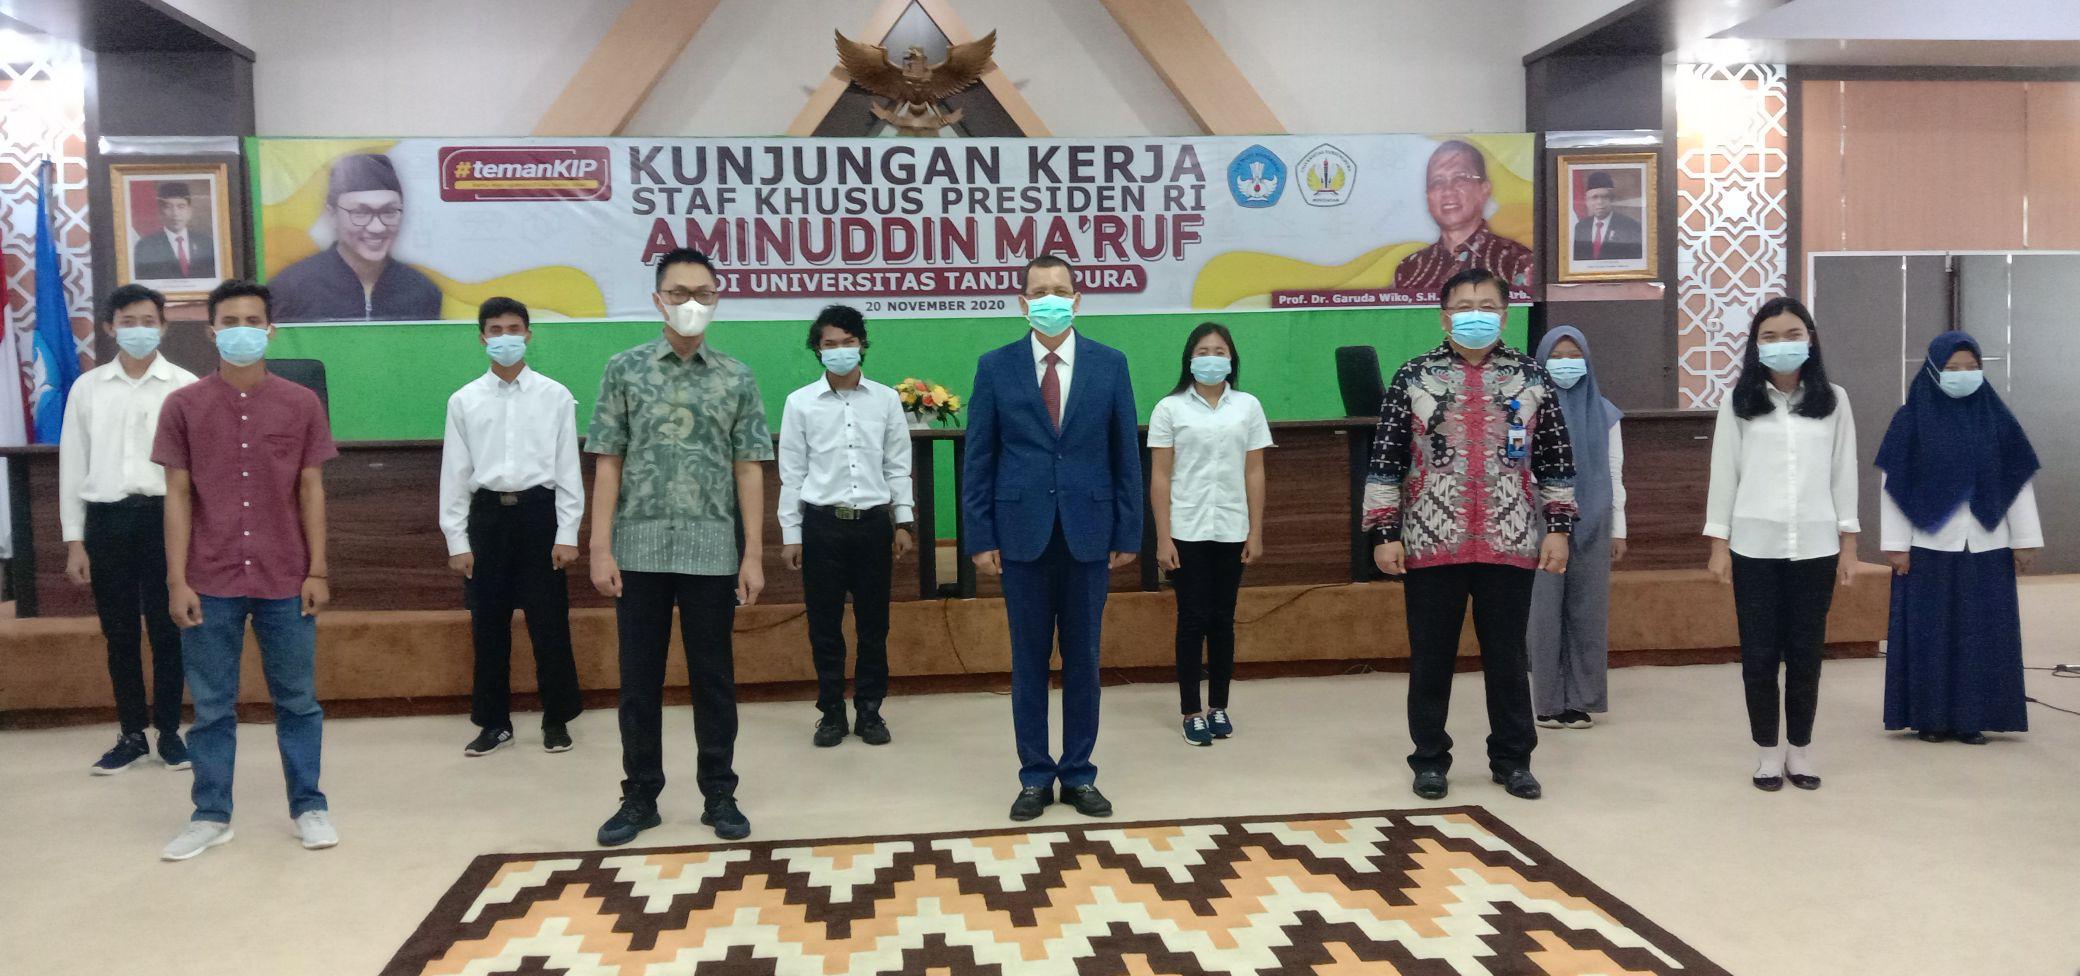 Staf Khusus Presiden RI, Aminuddin Ma'ruf mengunjungi Kampus Universitas Tanjungpura Kota Pontianak, Kalbar, Jumat 20 November 2020